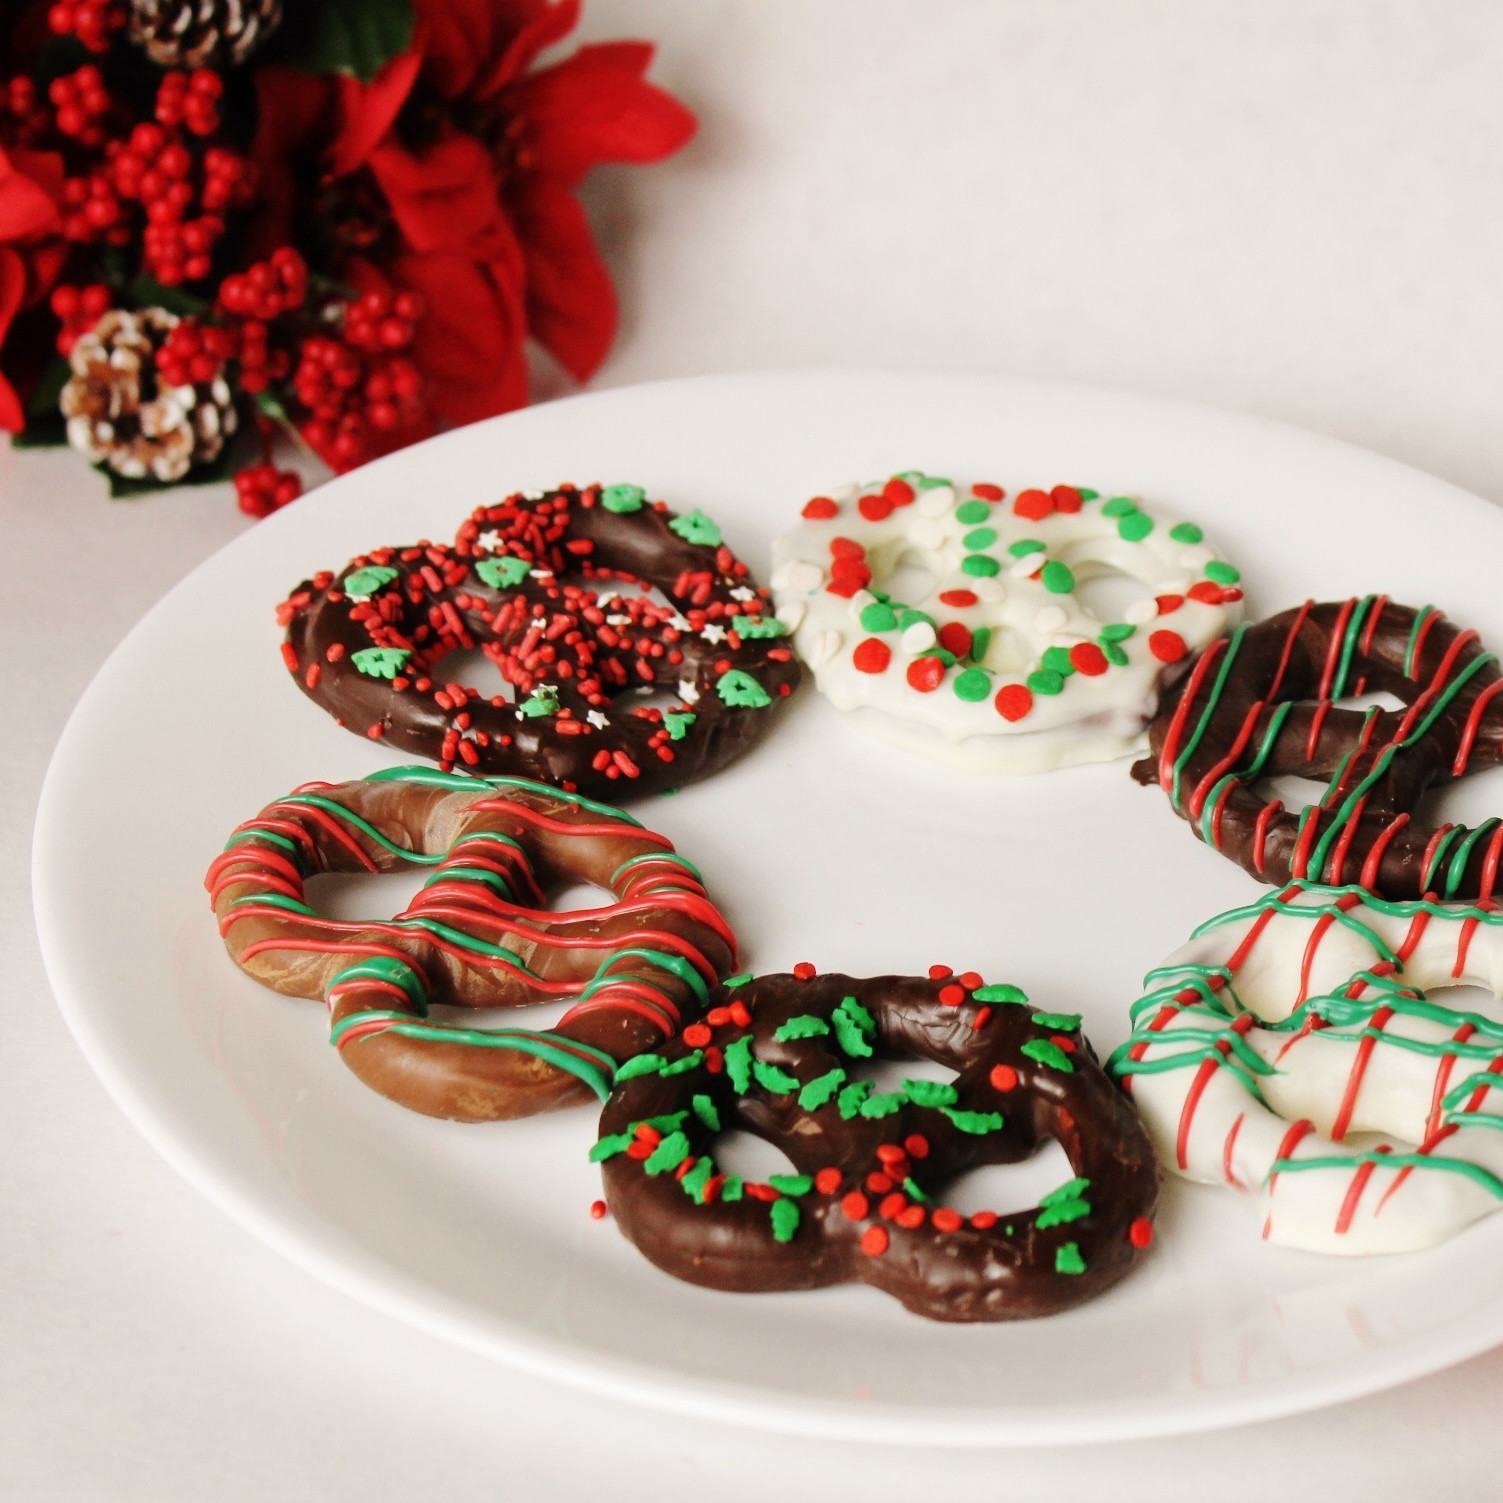 Chocolate Covered Pretzels Christmas  Christmas Chocolate Covered Pretzels Knots